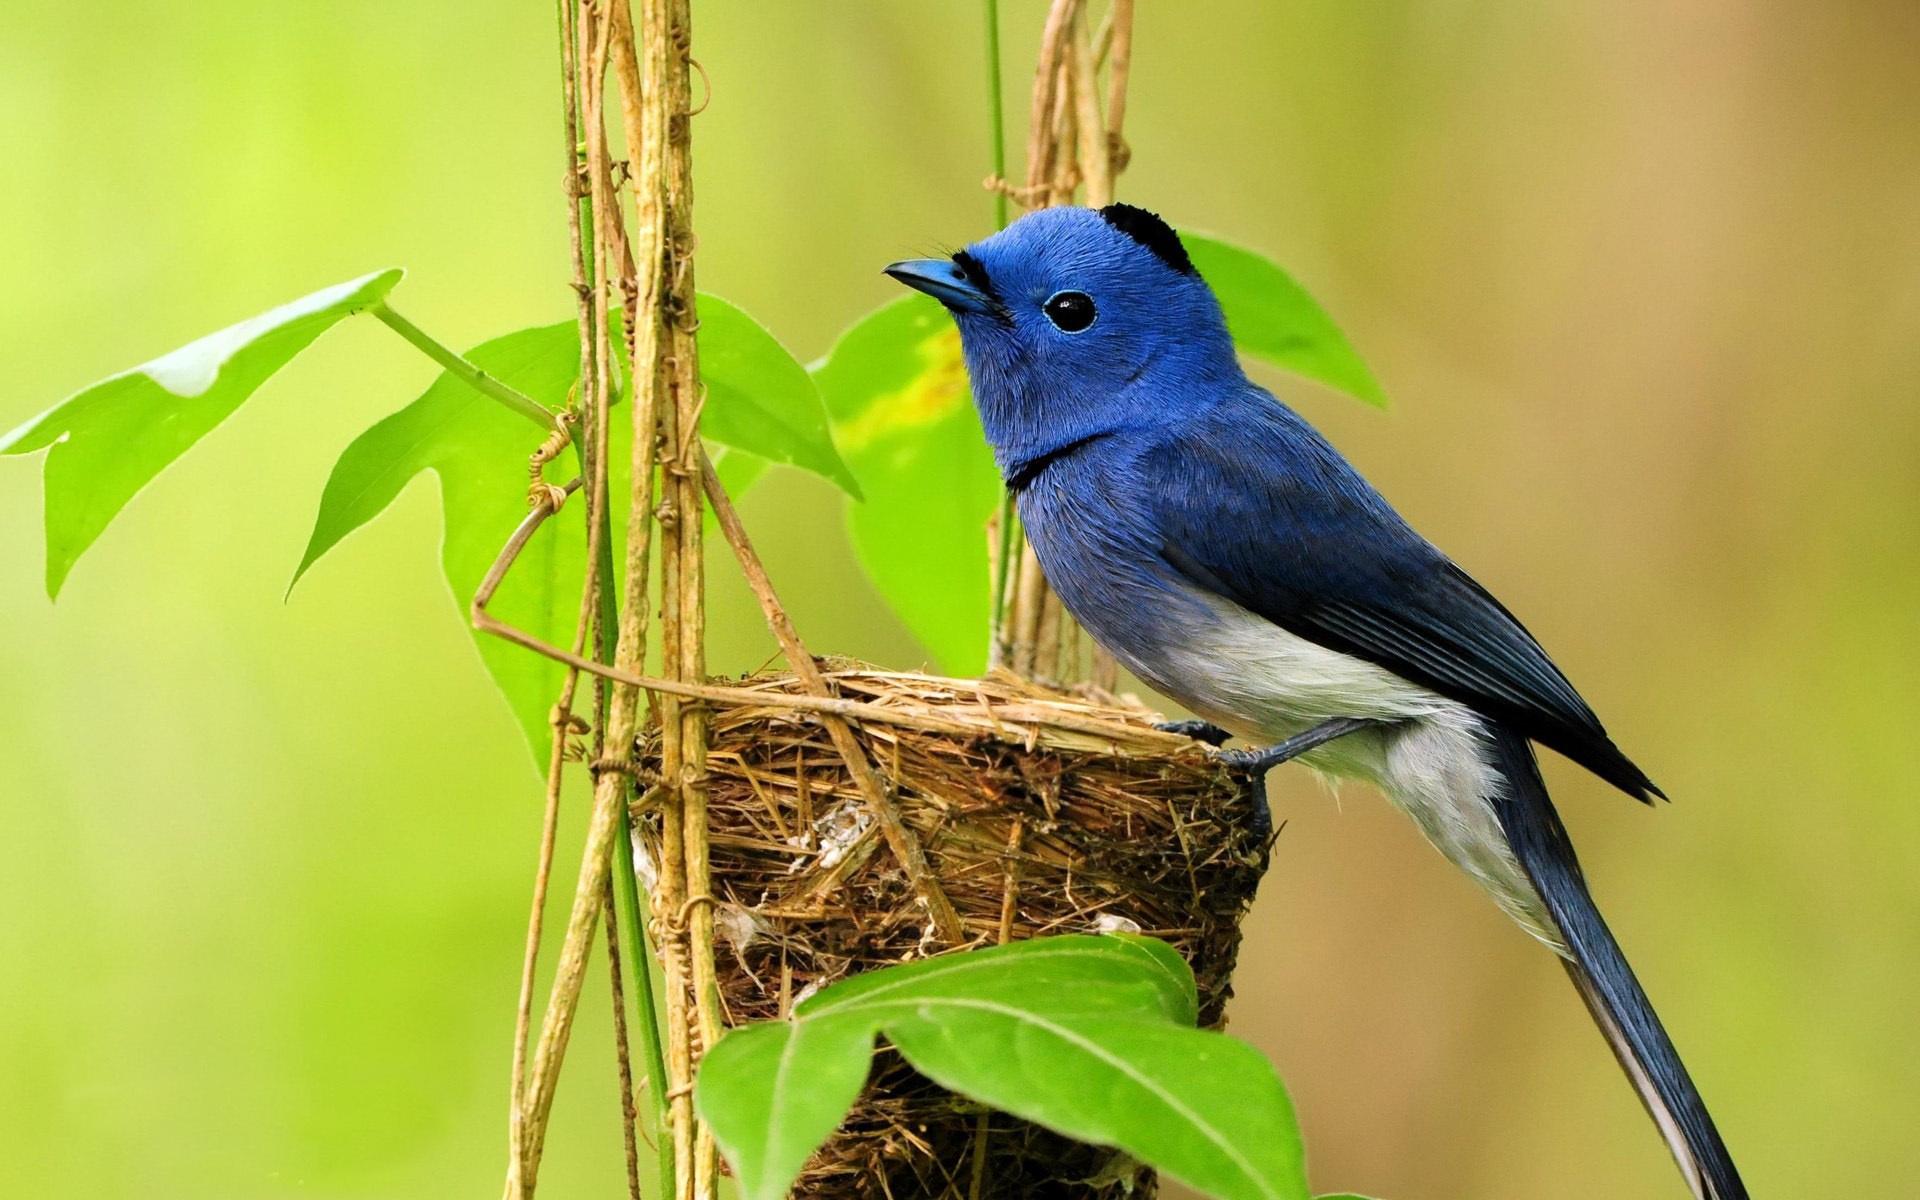 Fonds D Ecran Bleu Nid D Oiseau 1920x1200 Hd Image